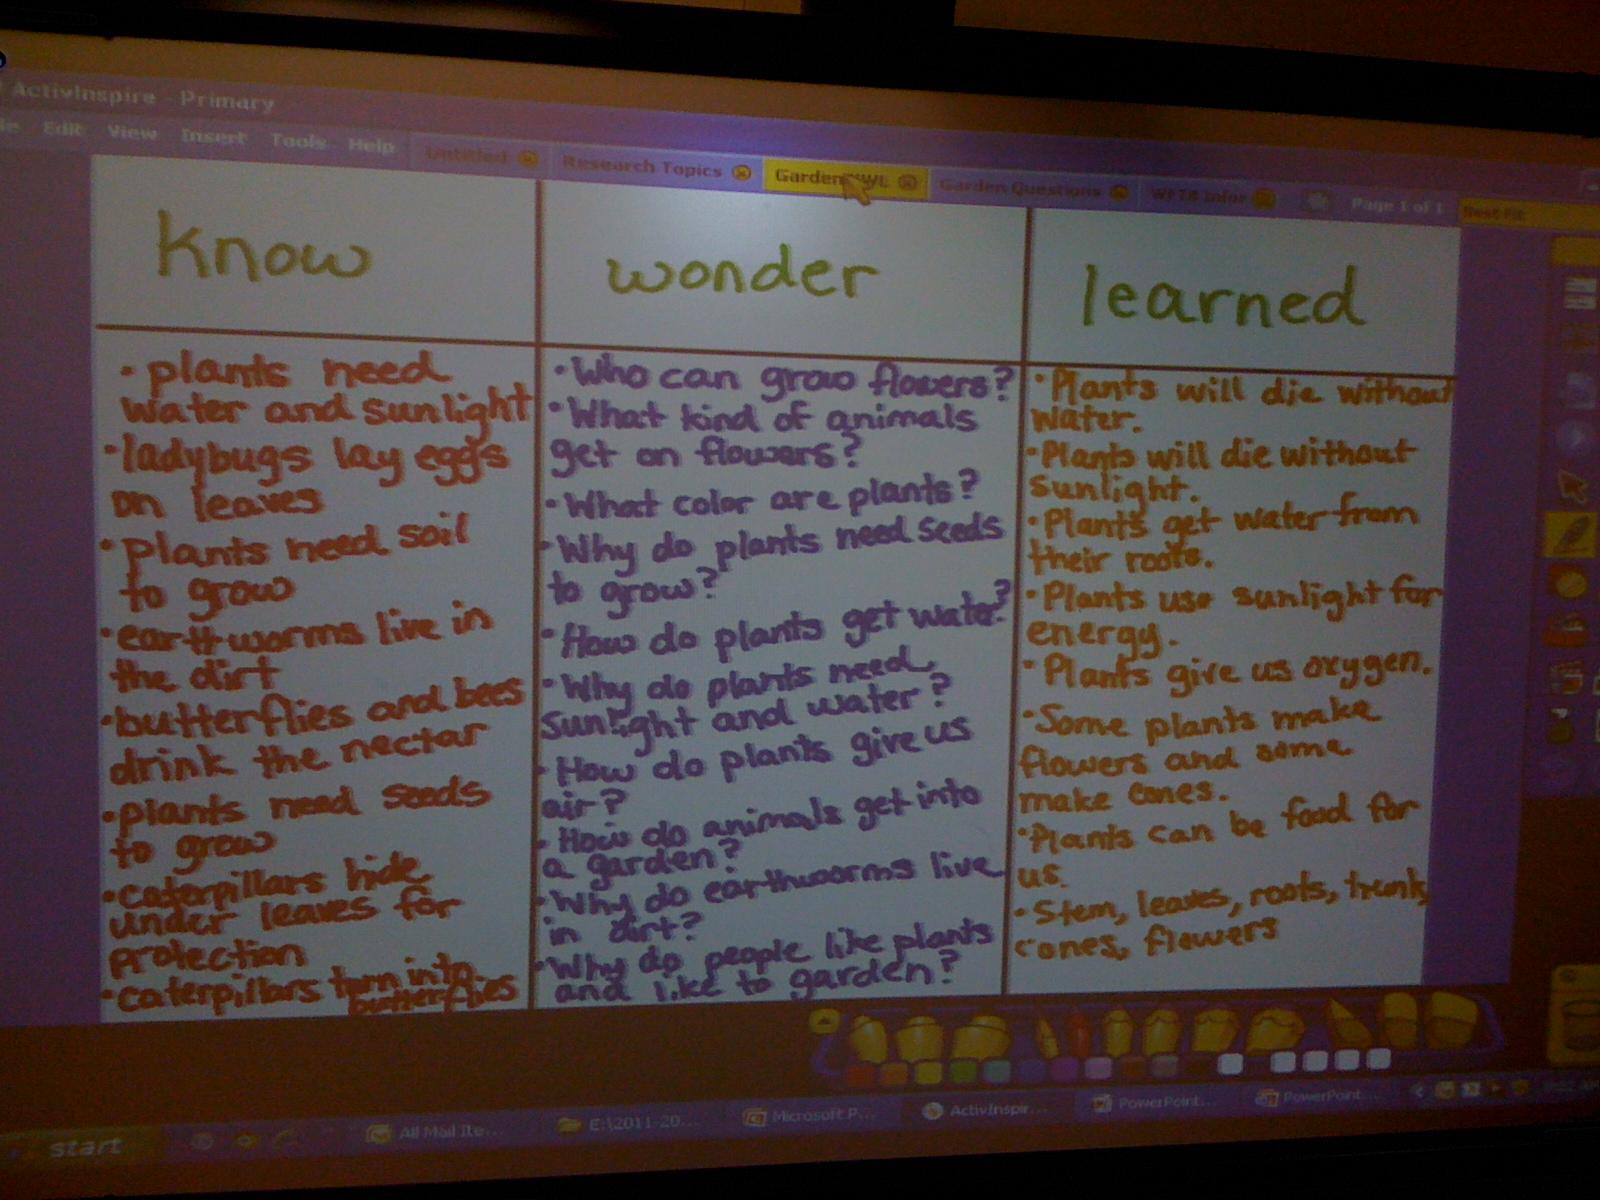 Bishop's Blackboard: An Elementary Education Blog: KWL Chart